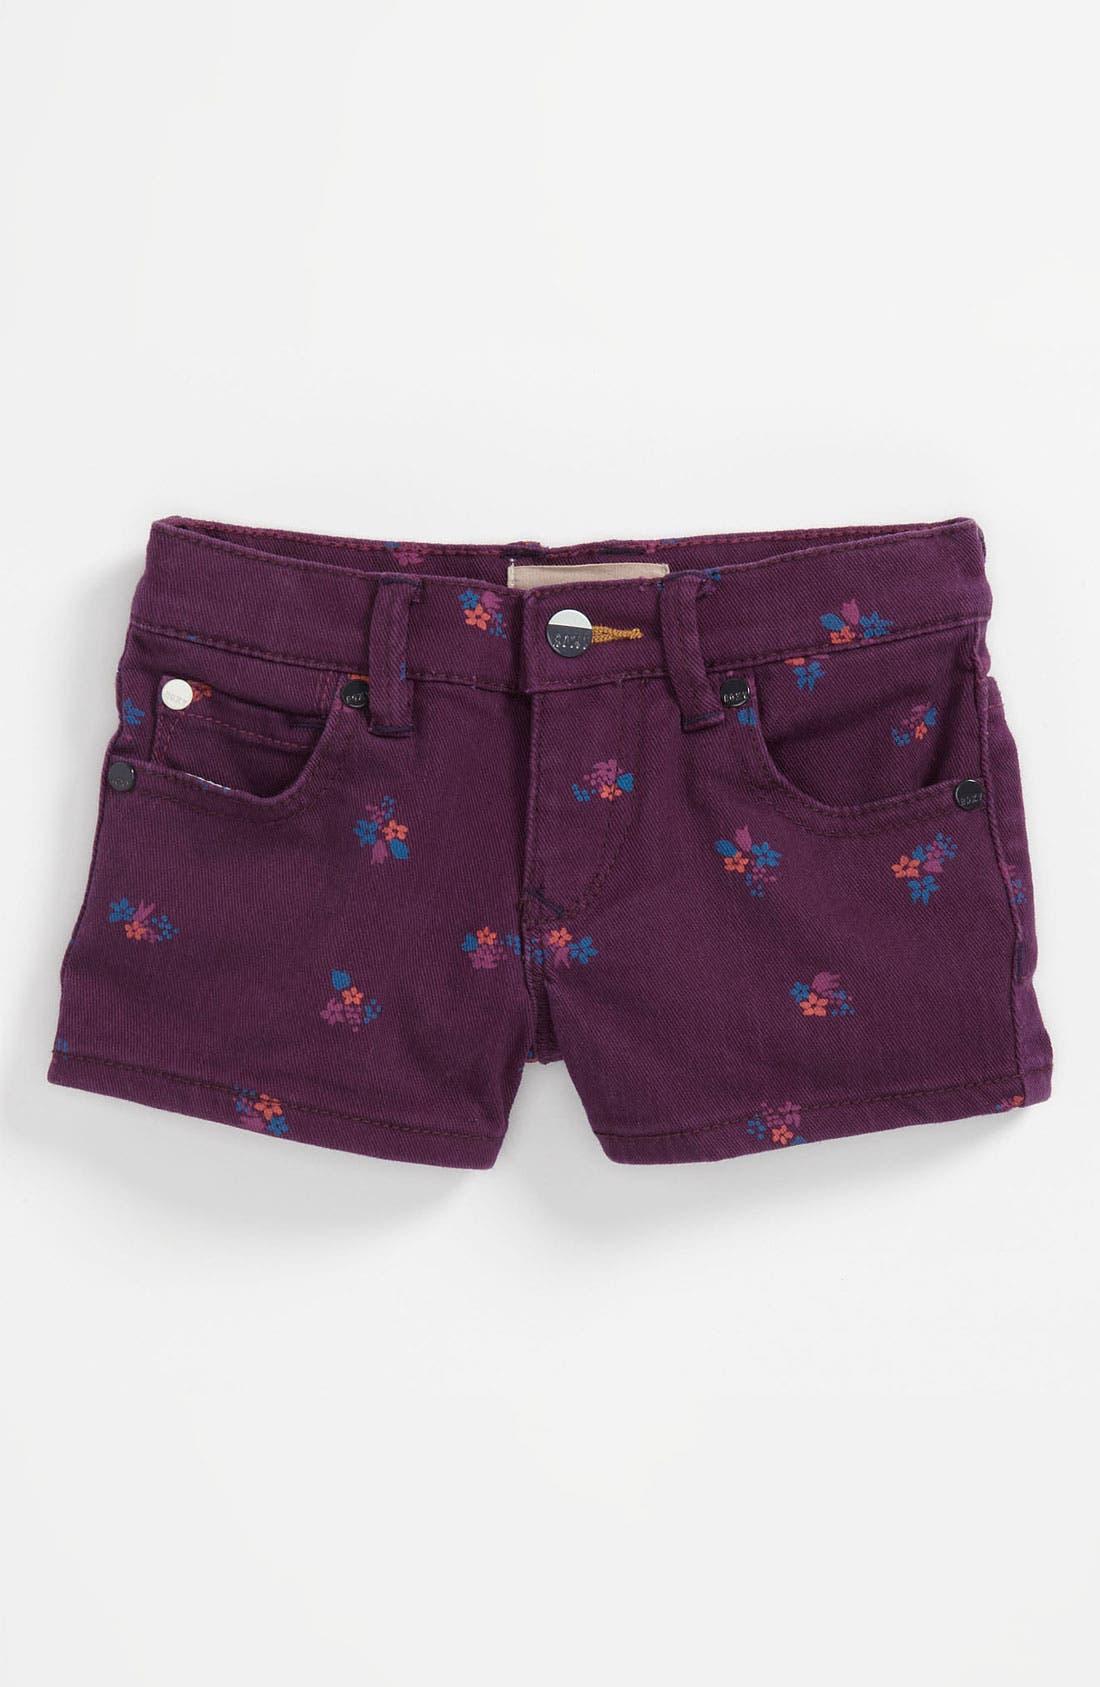 Alternate Image 2  - Roxy 'Sundown' Colored Shorts (Big Girls)